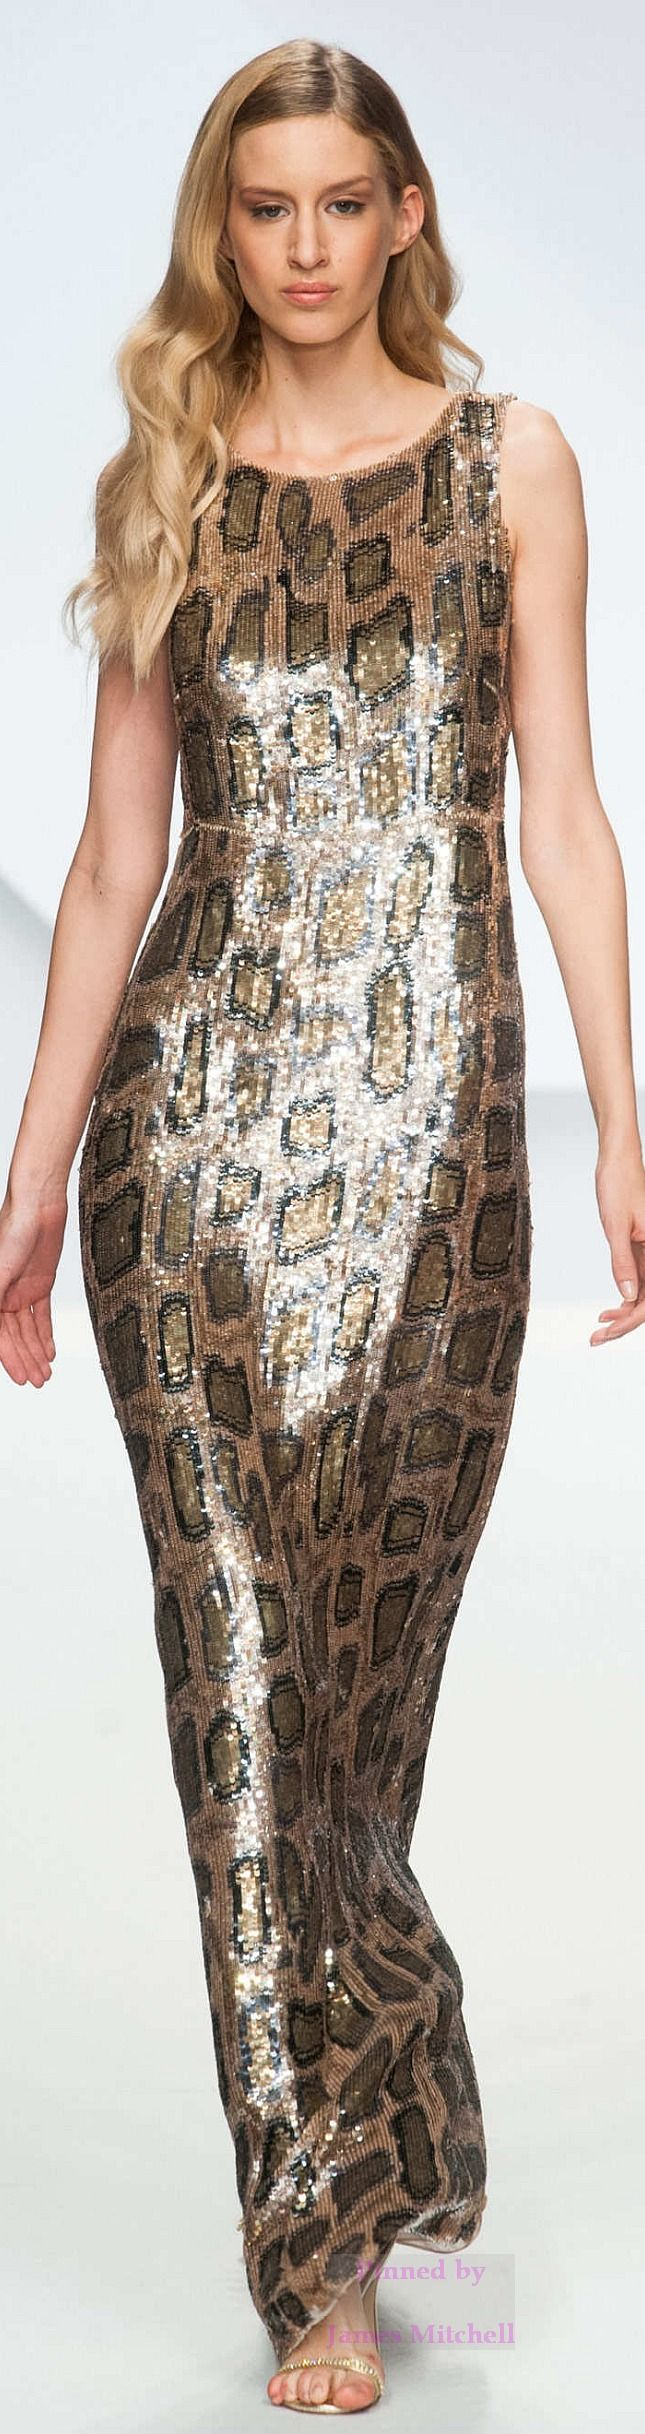 ~Krizia Snake Print Dress Animalistic Style #UNIQUE_WOMENS_FASHION